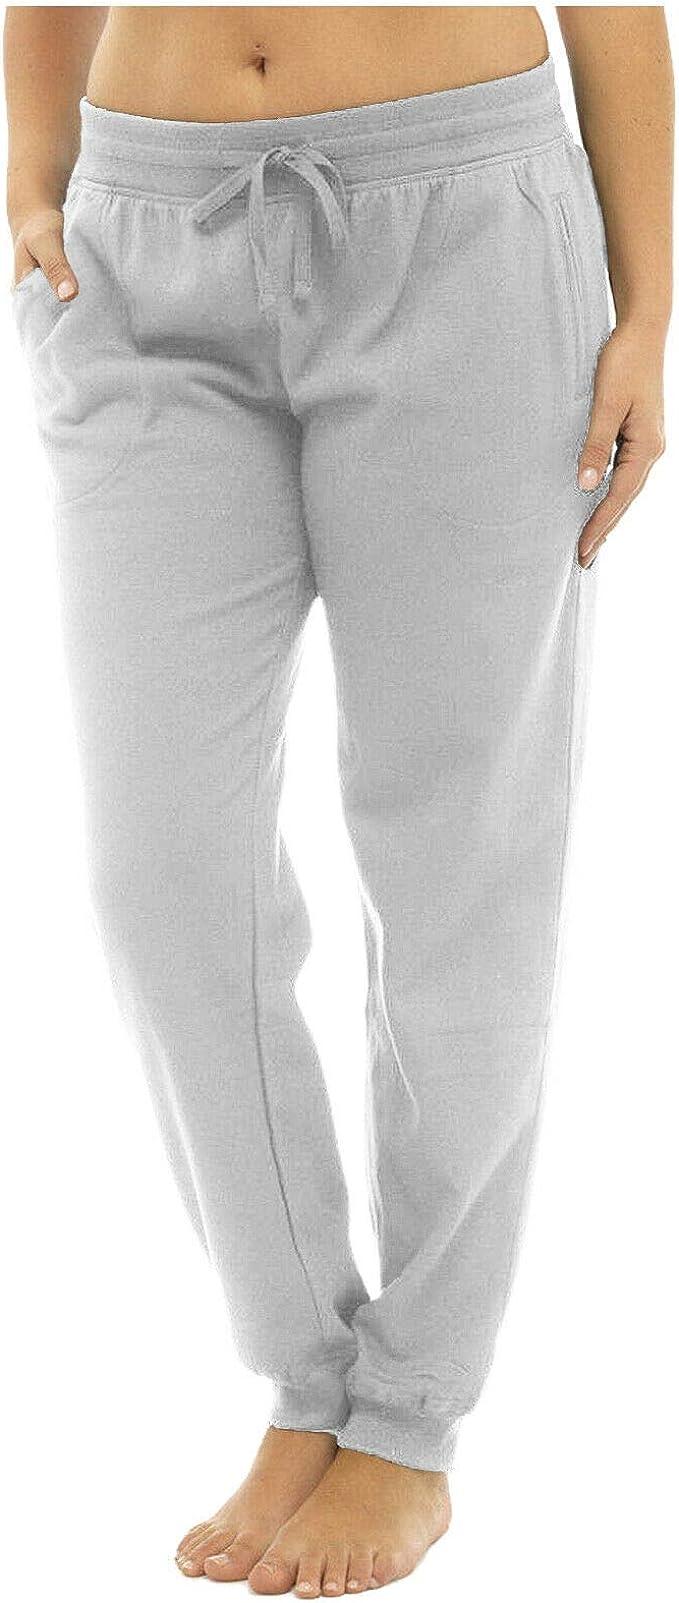 MyShoeStore Pantalones de chándal para Mujer Gris Dobladillo ...